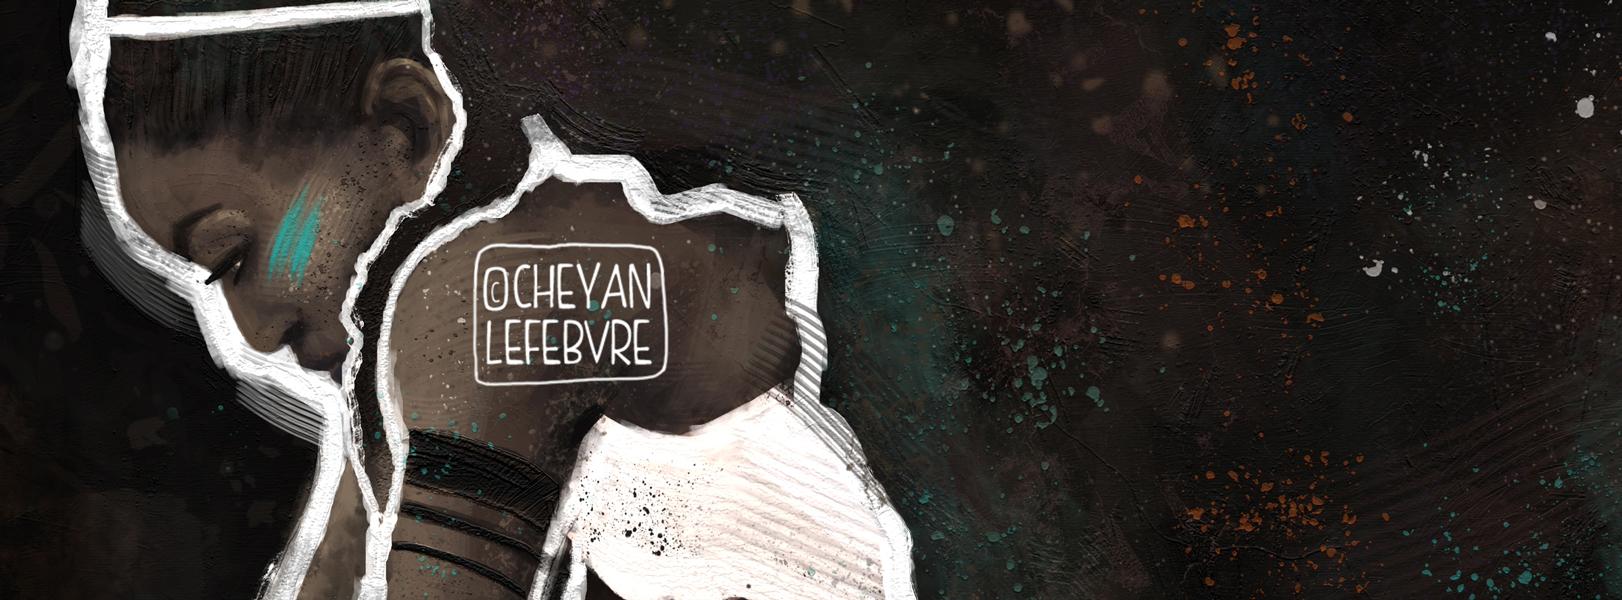 Cheyan Lefebvre - Africa Thinking #drawing #illustration #digitalart #art #painting #digitalpainting #africa #african #goddess #black #naturalhair #curlyhair #afro #bighair